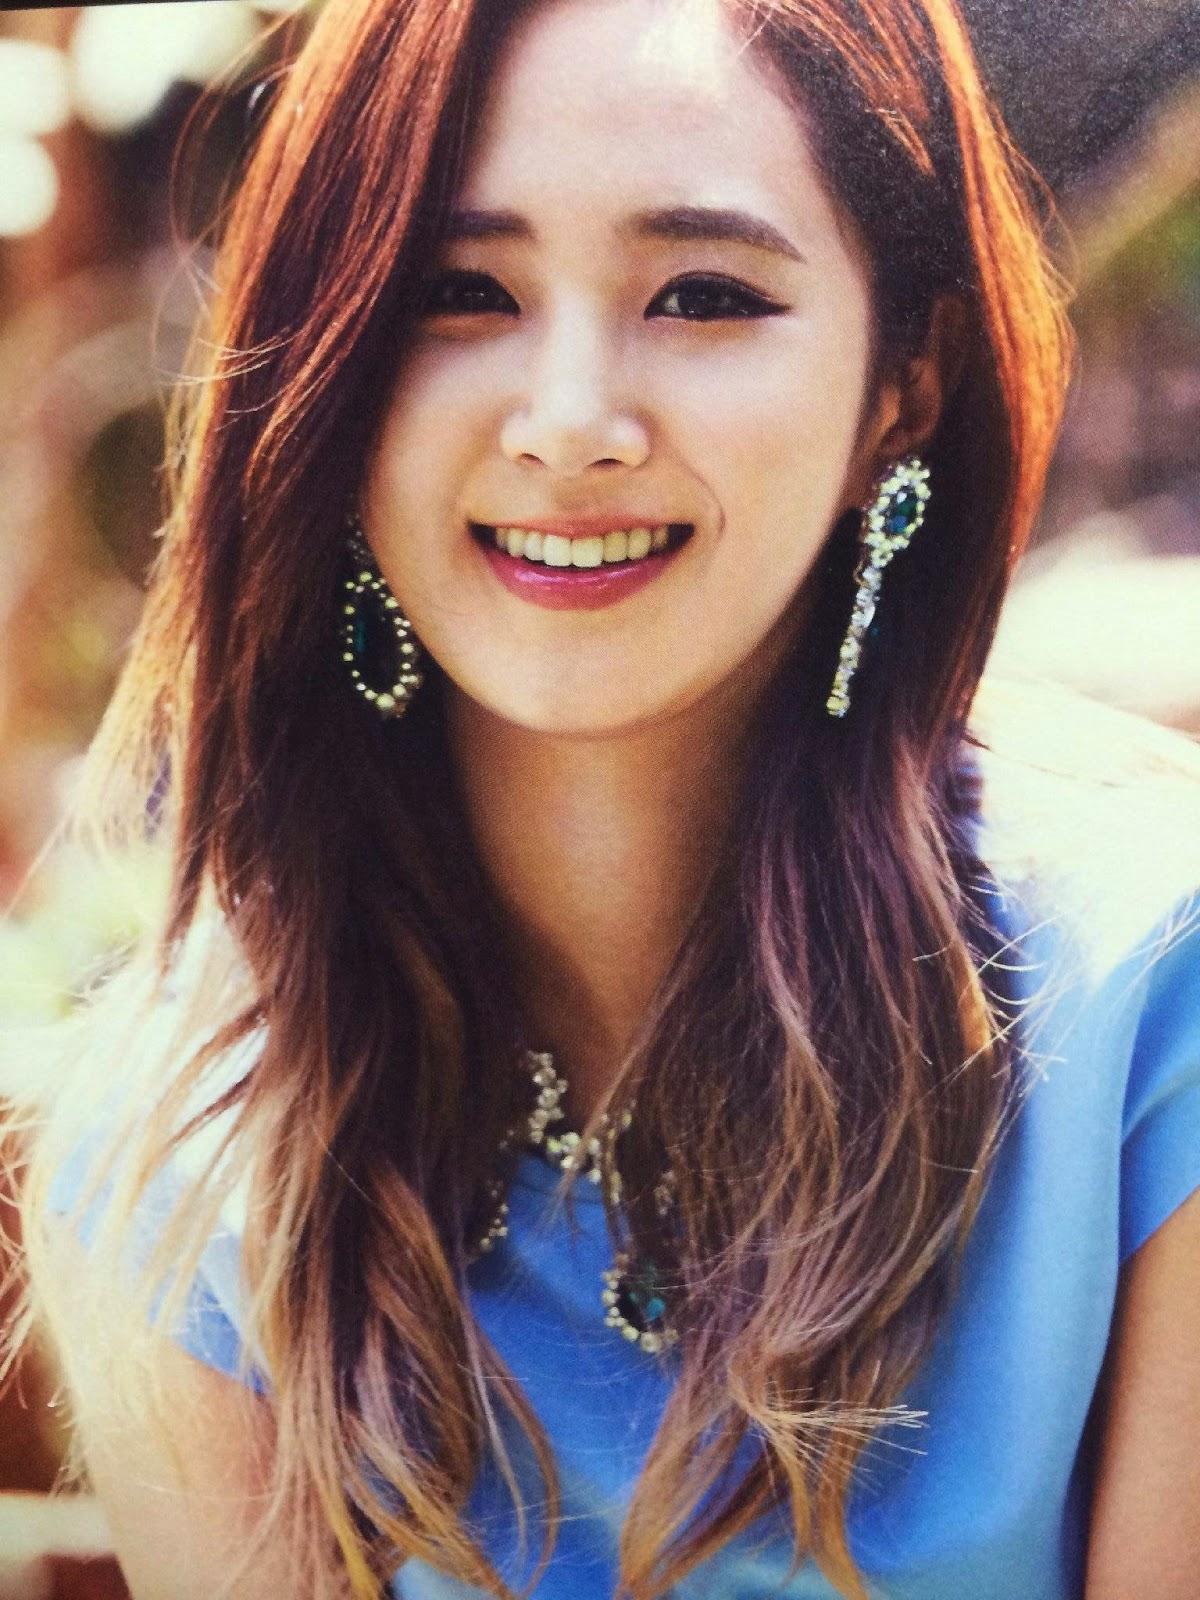 SNSD Yuri (유리; ユリ) Girls Generation The Best Scan Photos 8